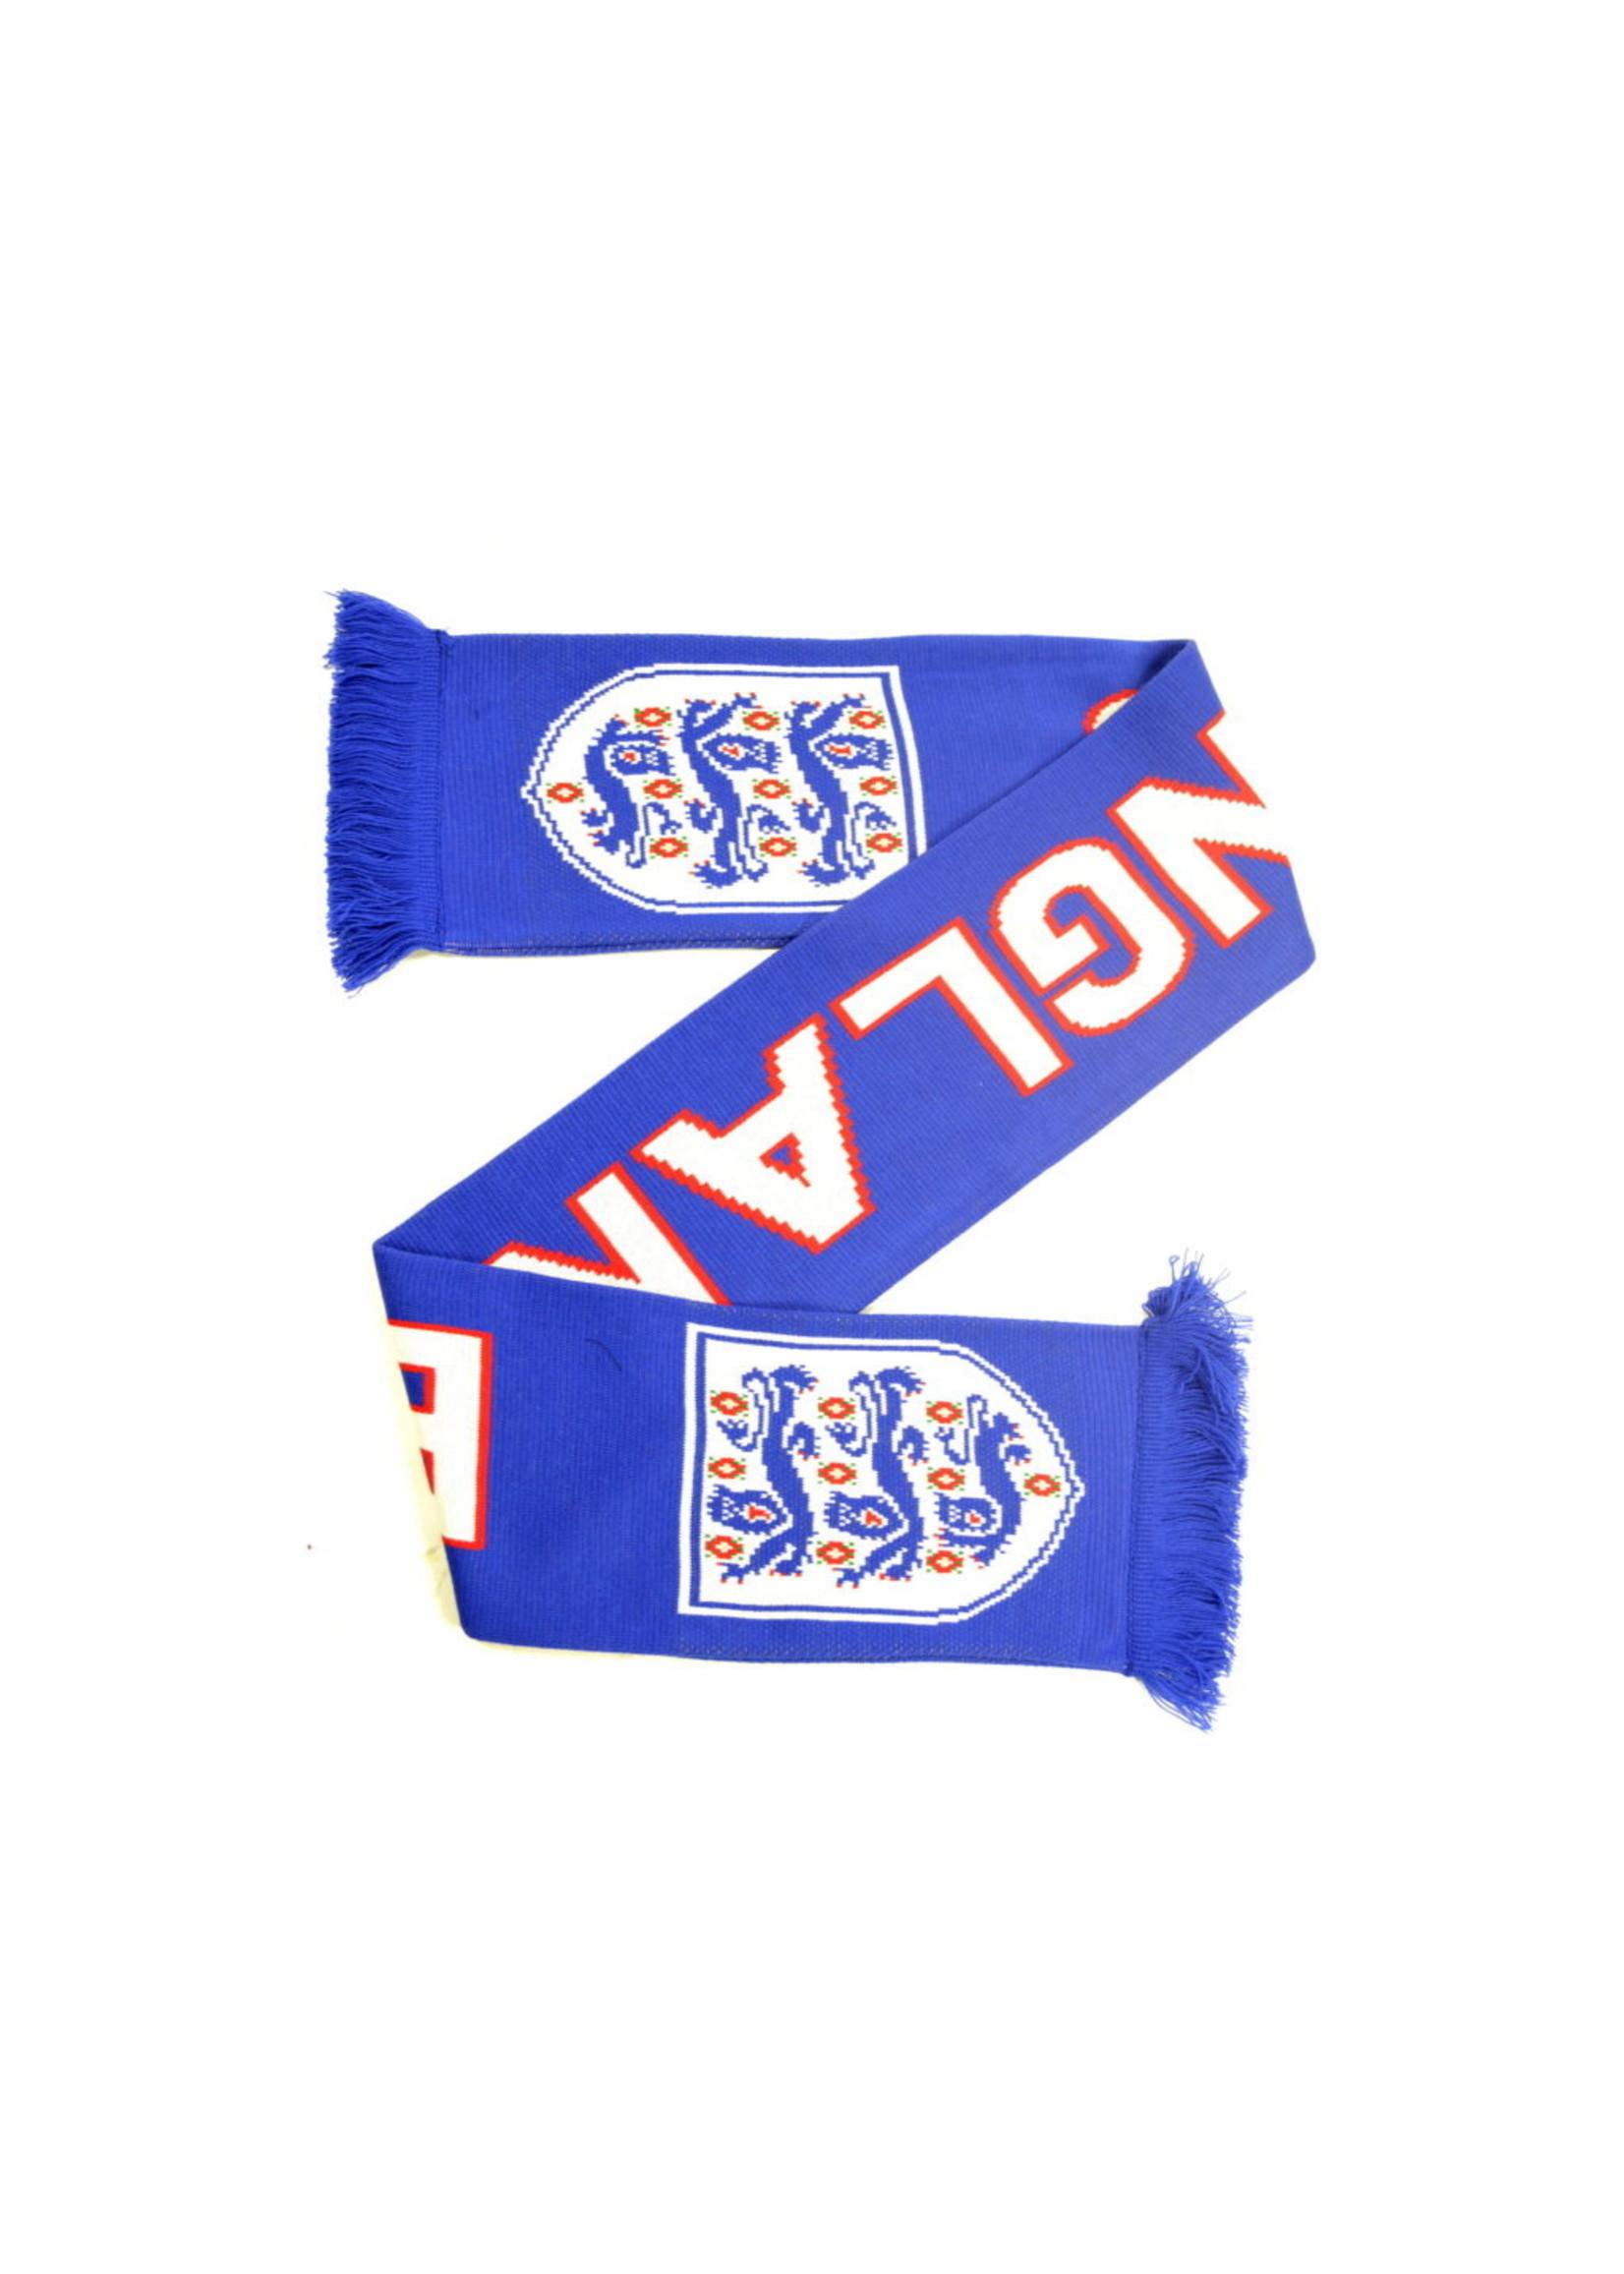 England Blue 3 Lions Scarf